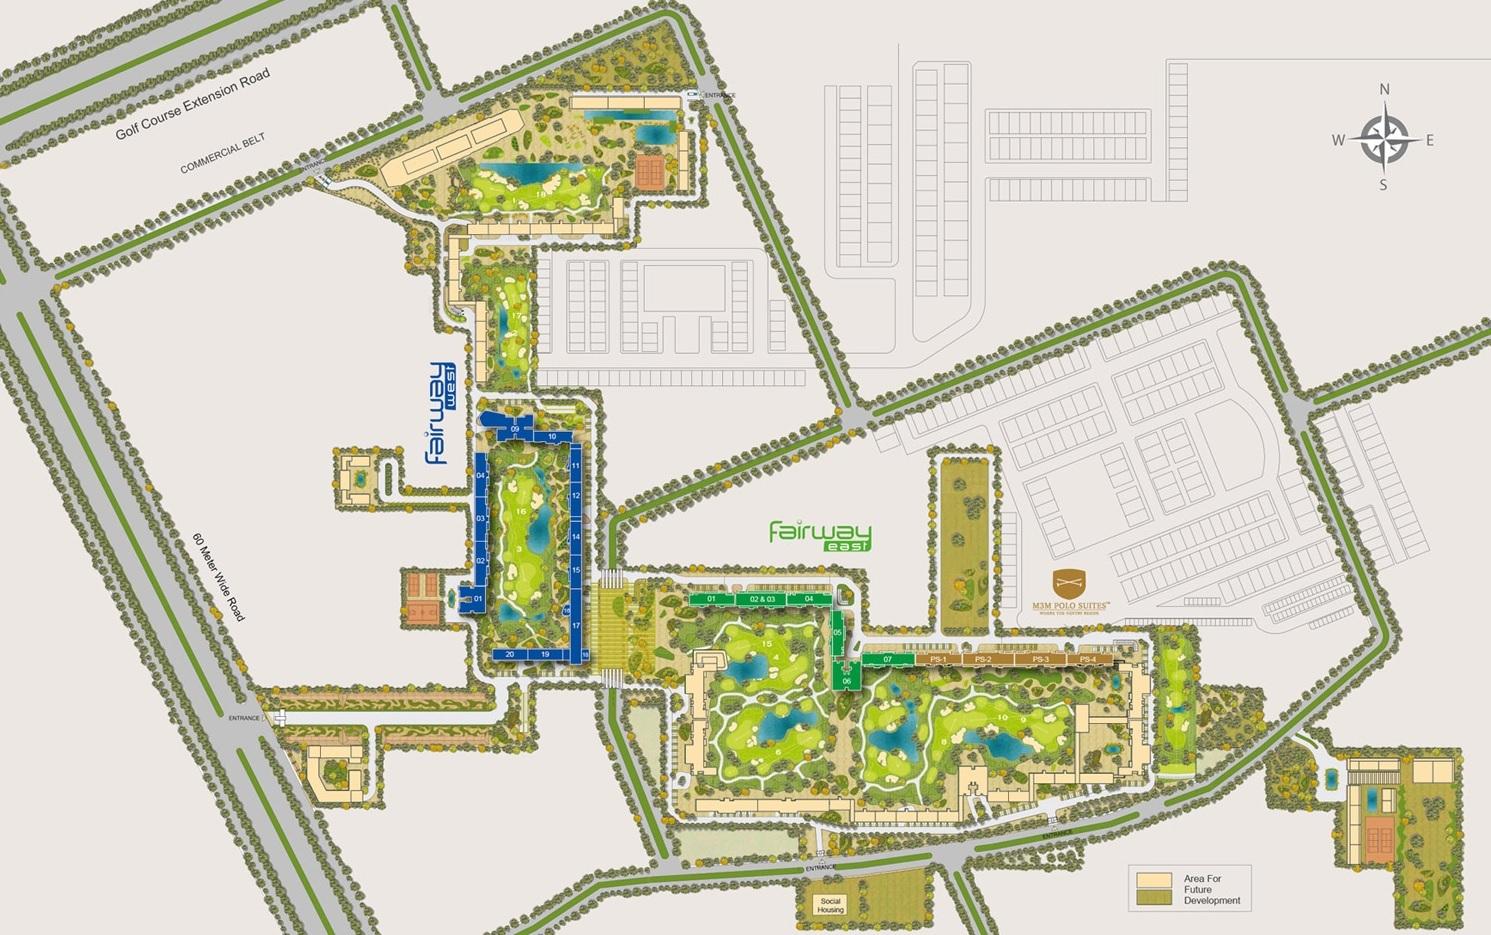 m3m golf estate fairway east master plan image6